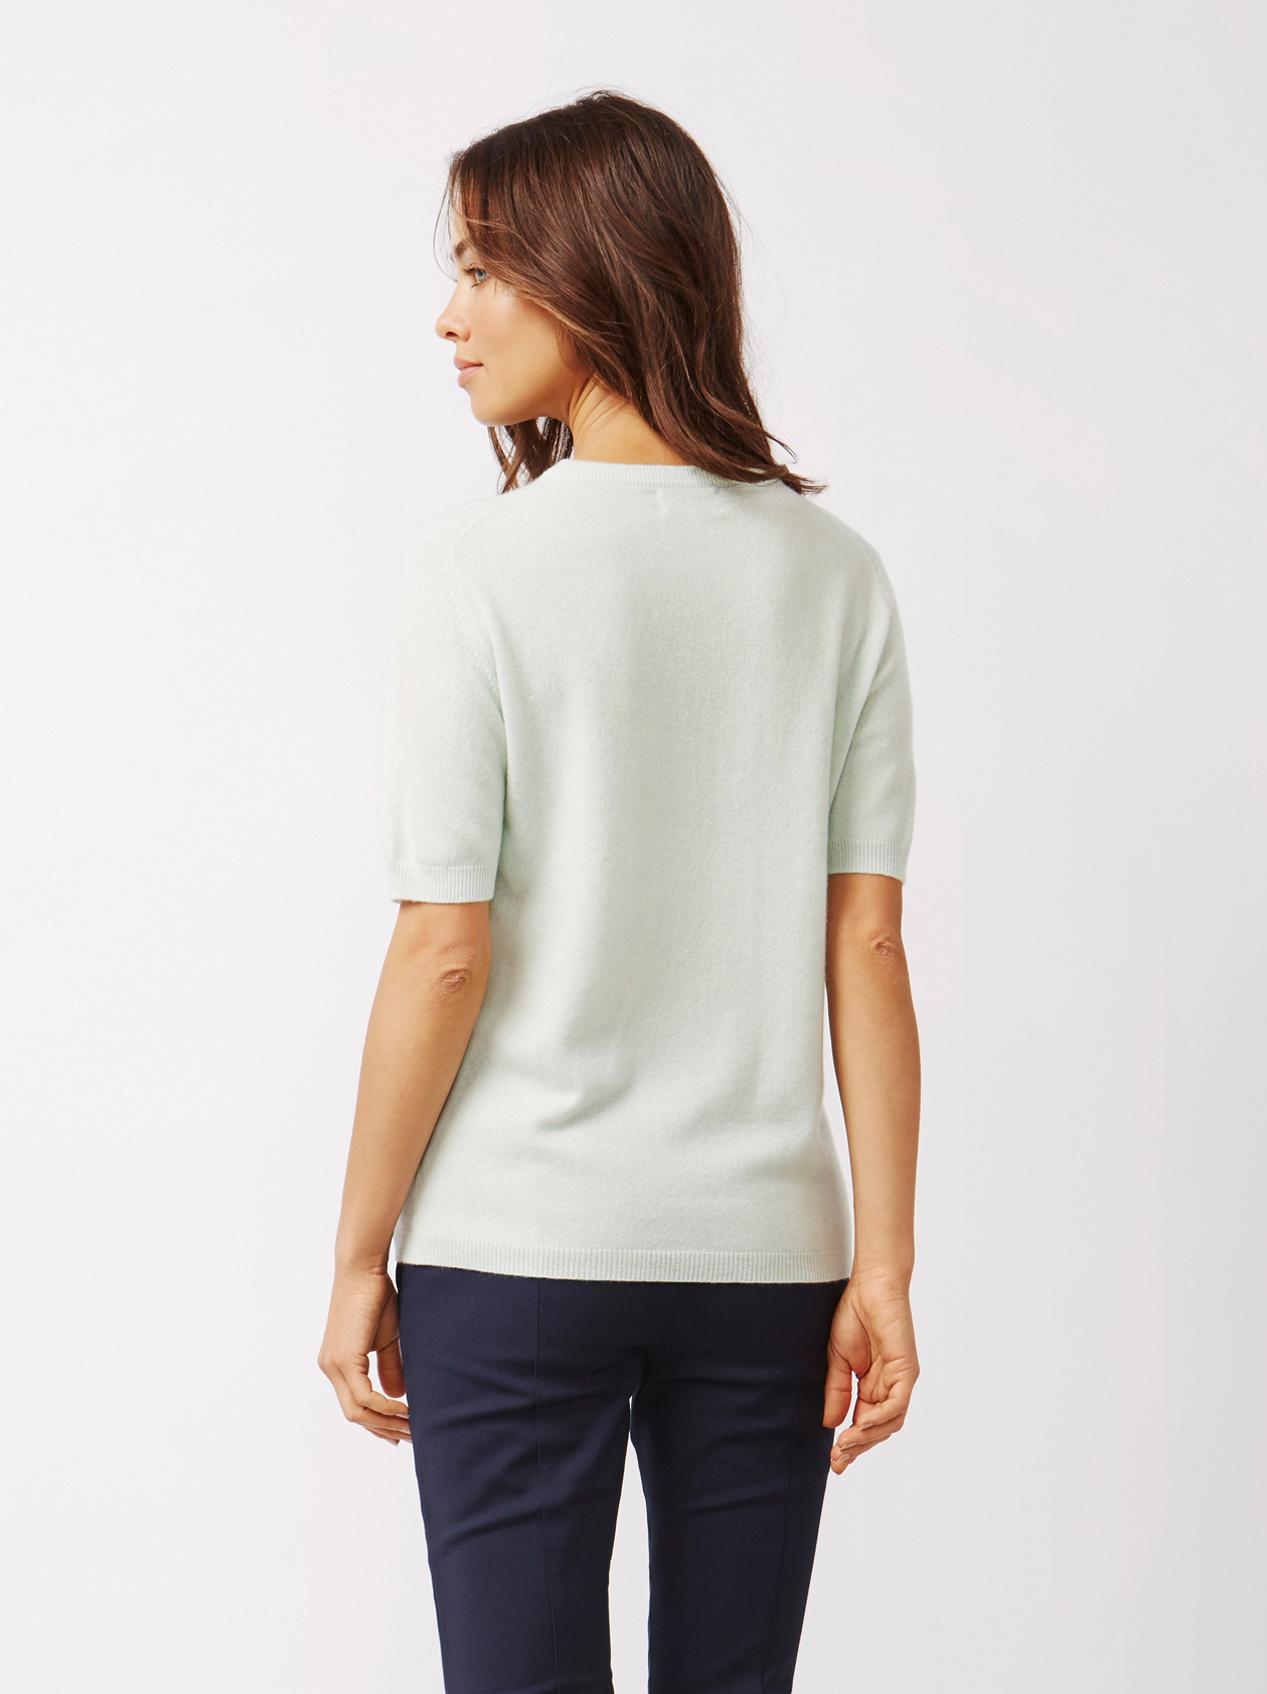 Soft Goat Women's Short Sleeve O-Neck Sorbet Mint